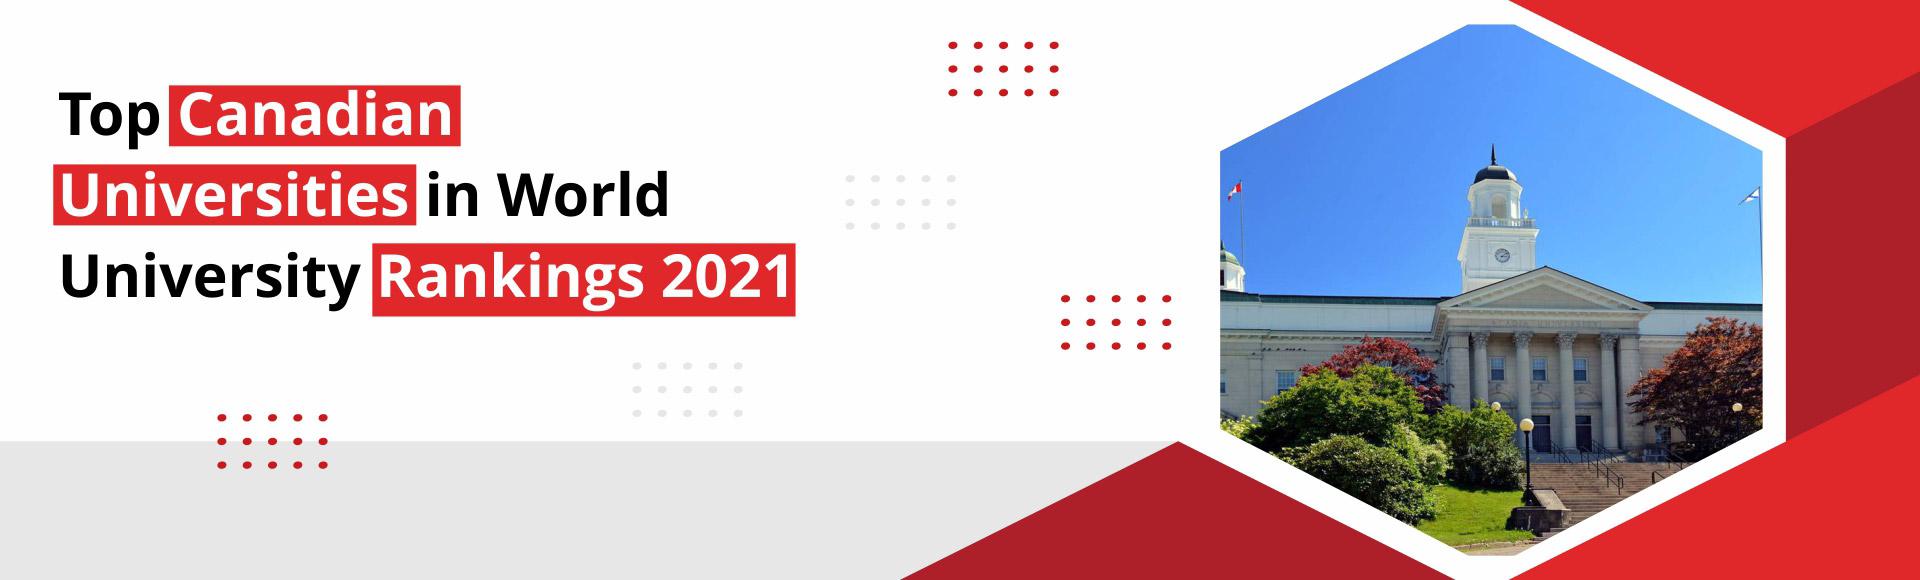 Top Canadian universities in World University Ranking 2021